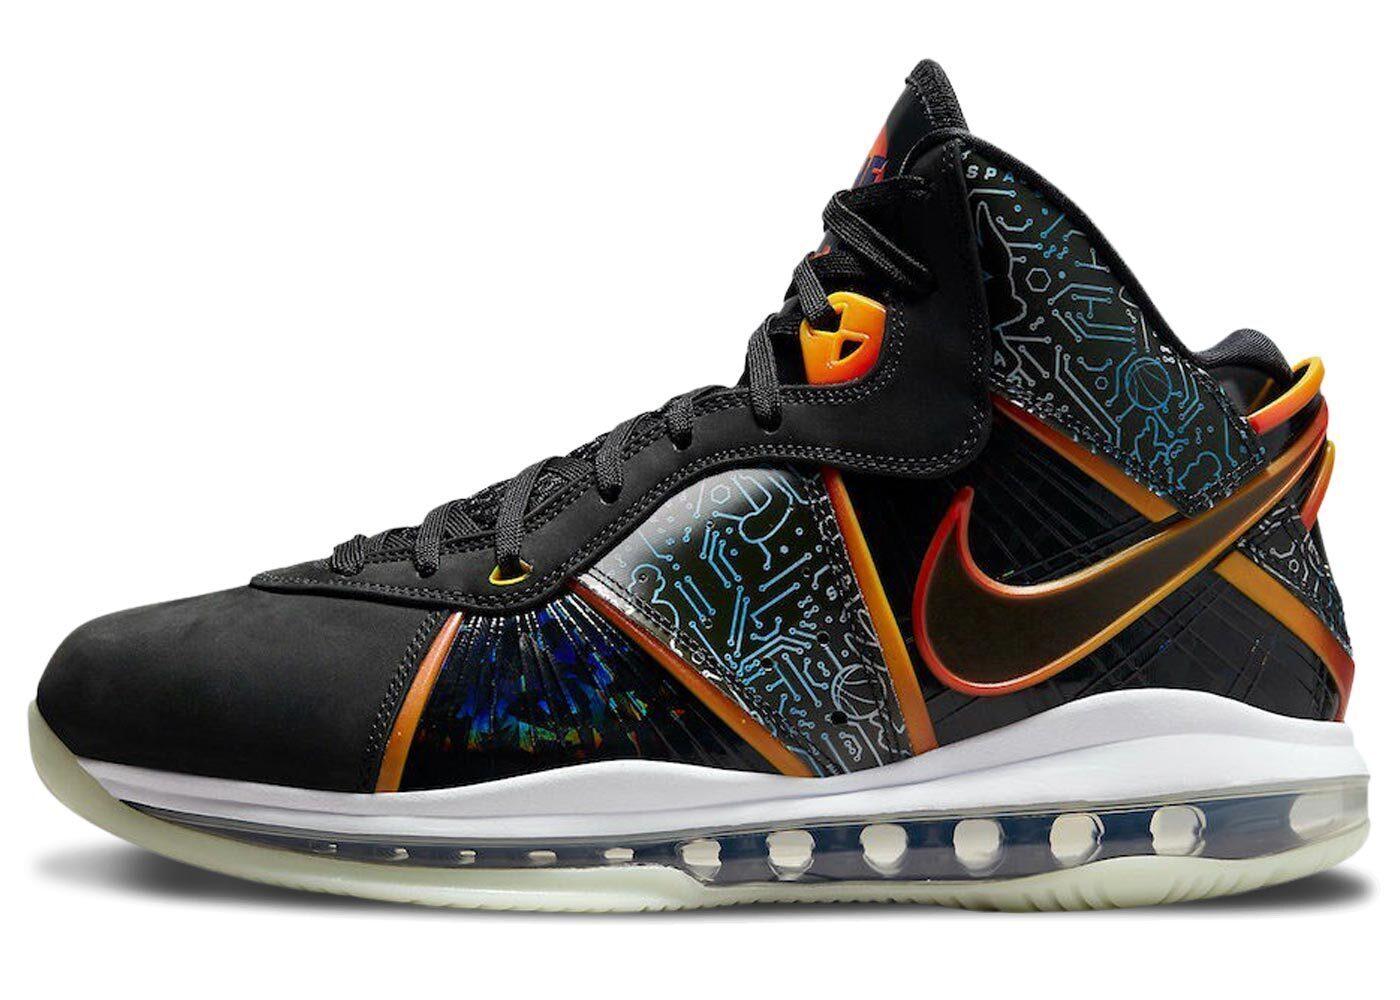 Nike Lebron 8 Space Jamの写真